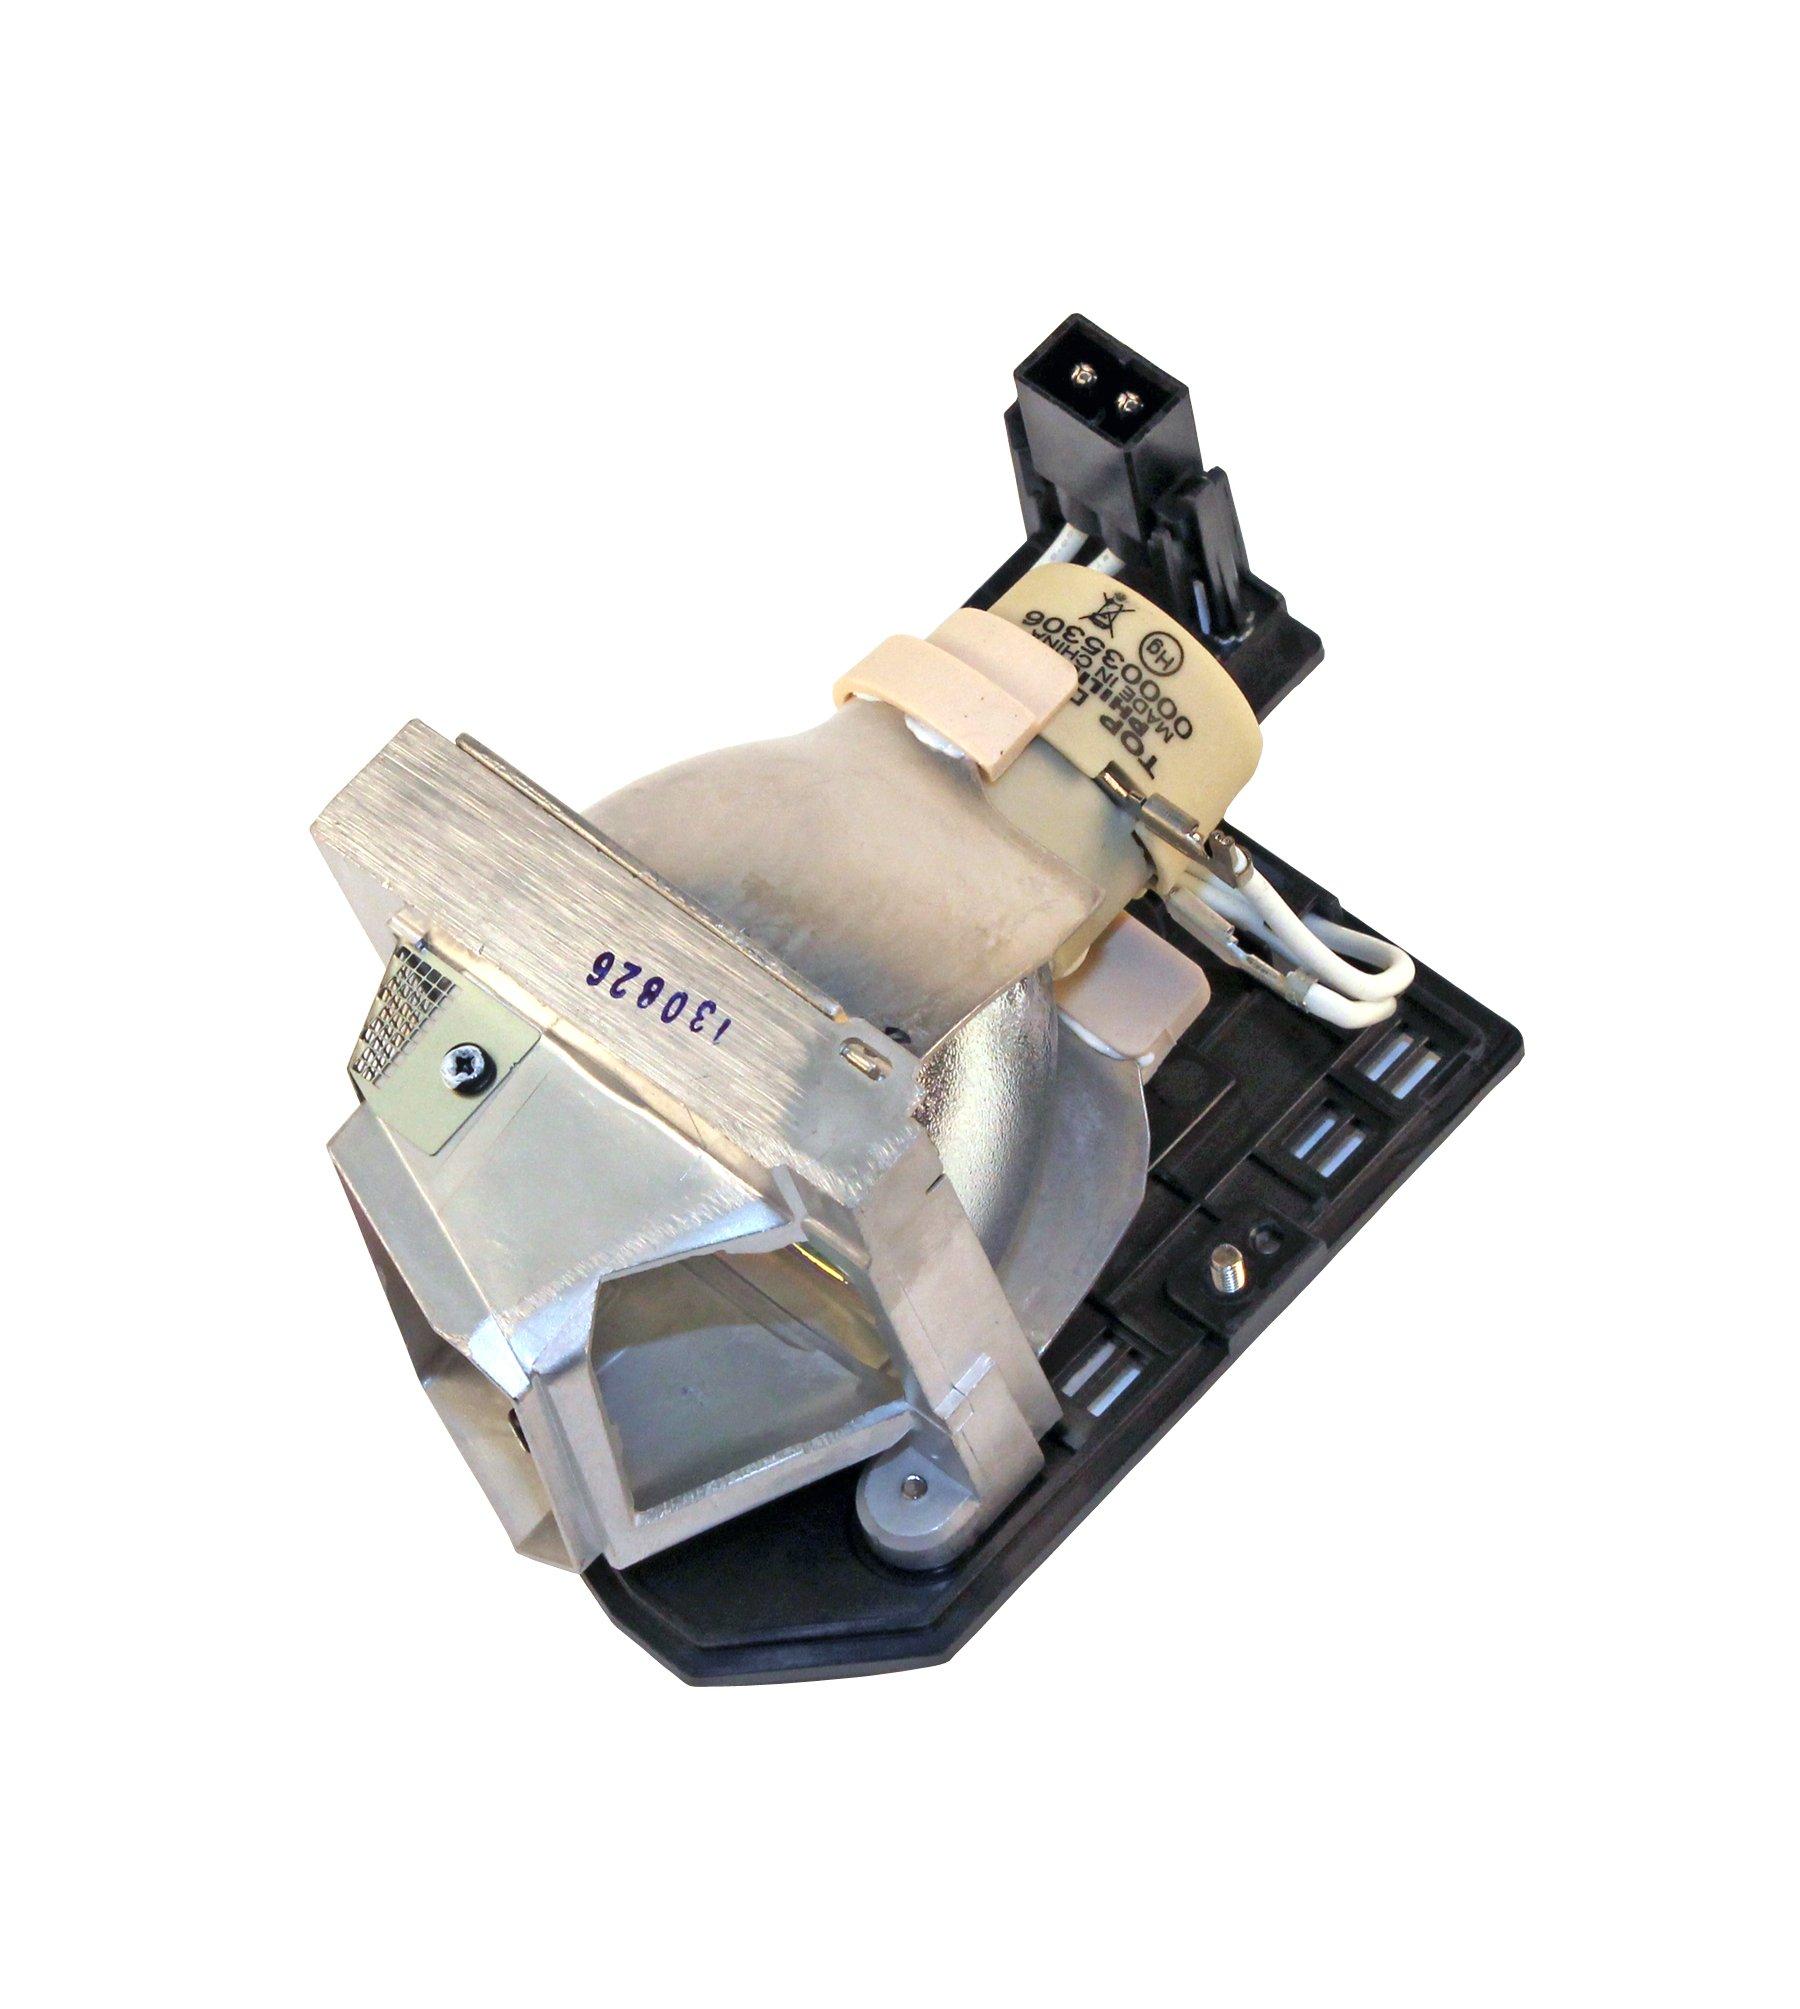 Optoma BL-FU190E, UHP, 190W Projector Lamp